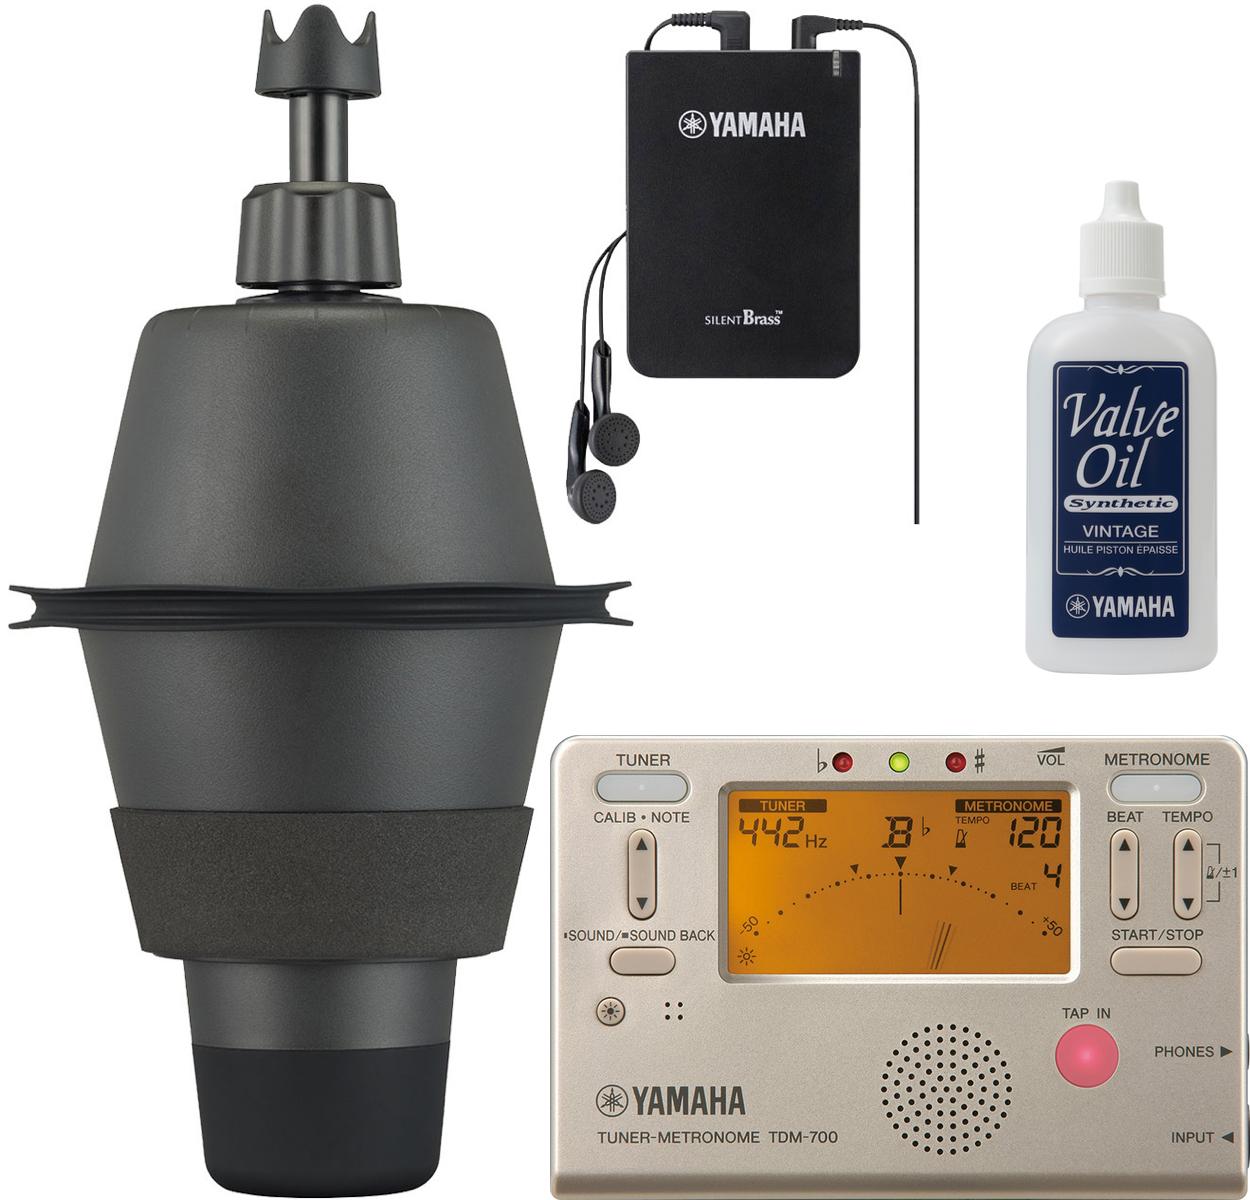 YAMAHA ( ヤマハ ) 【予約】 SB2X ユーフォニアム サイレントブラス ミュート PM2X パーソナルスタジオ STX-2 SILENT BRASS 弱音器 TDM-700G セット 北海道 沖縄 離島不可